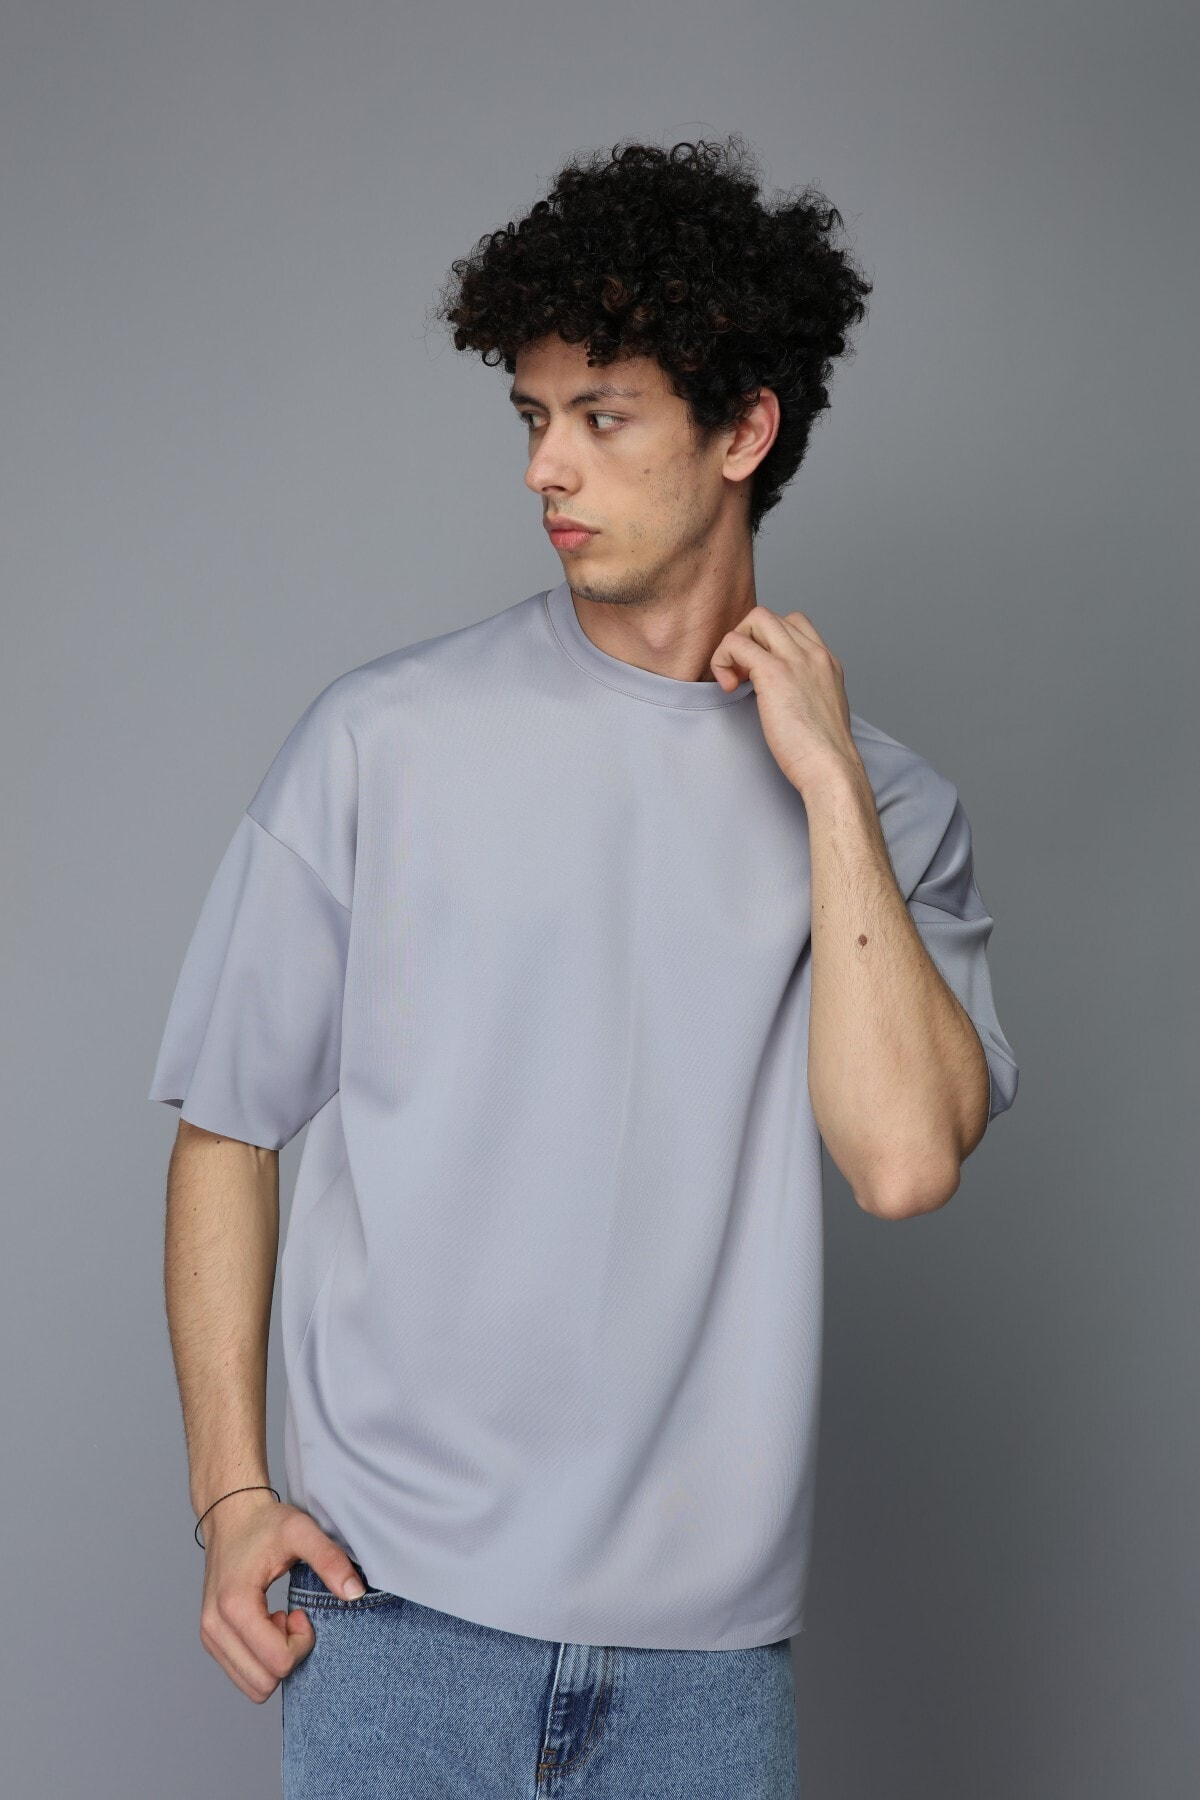 Rocqerx Unisex Gri Scuba Tshirt 1